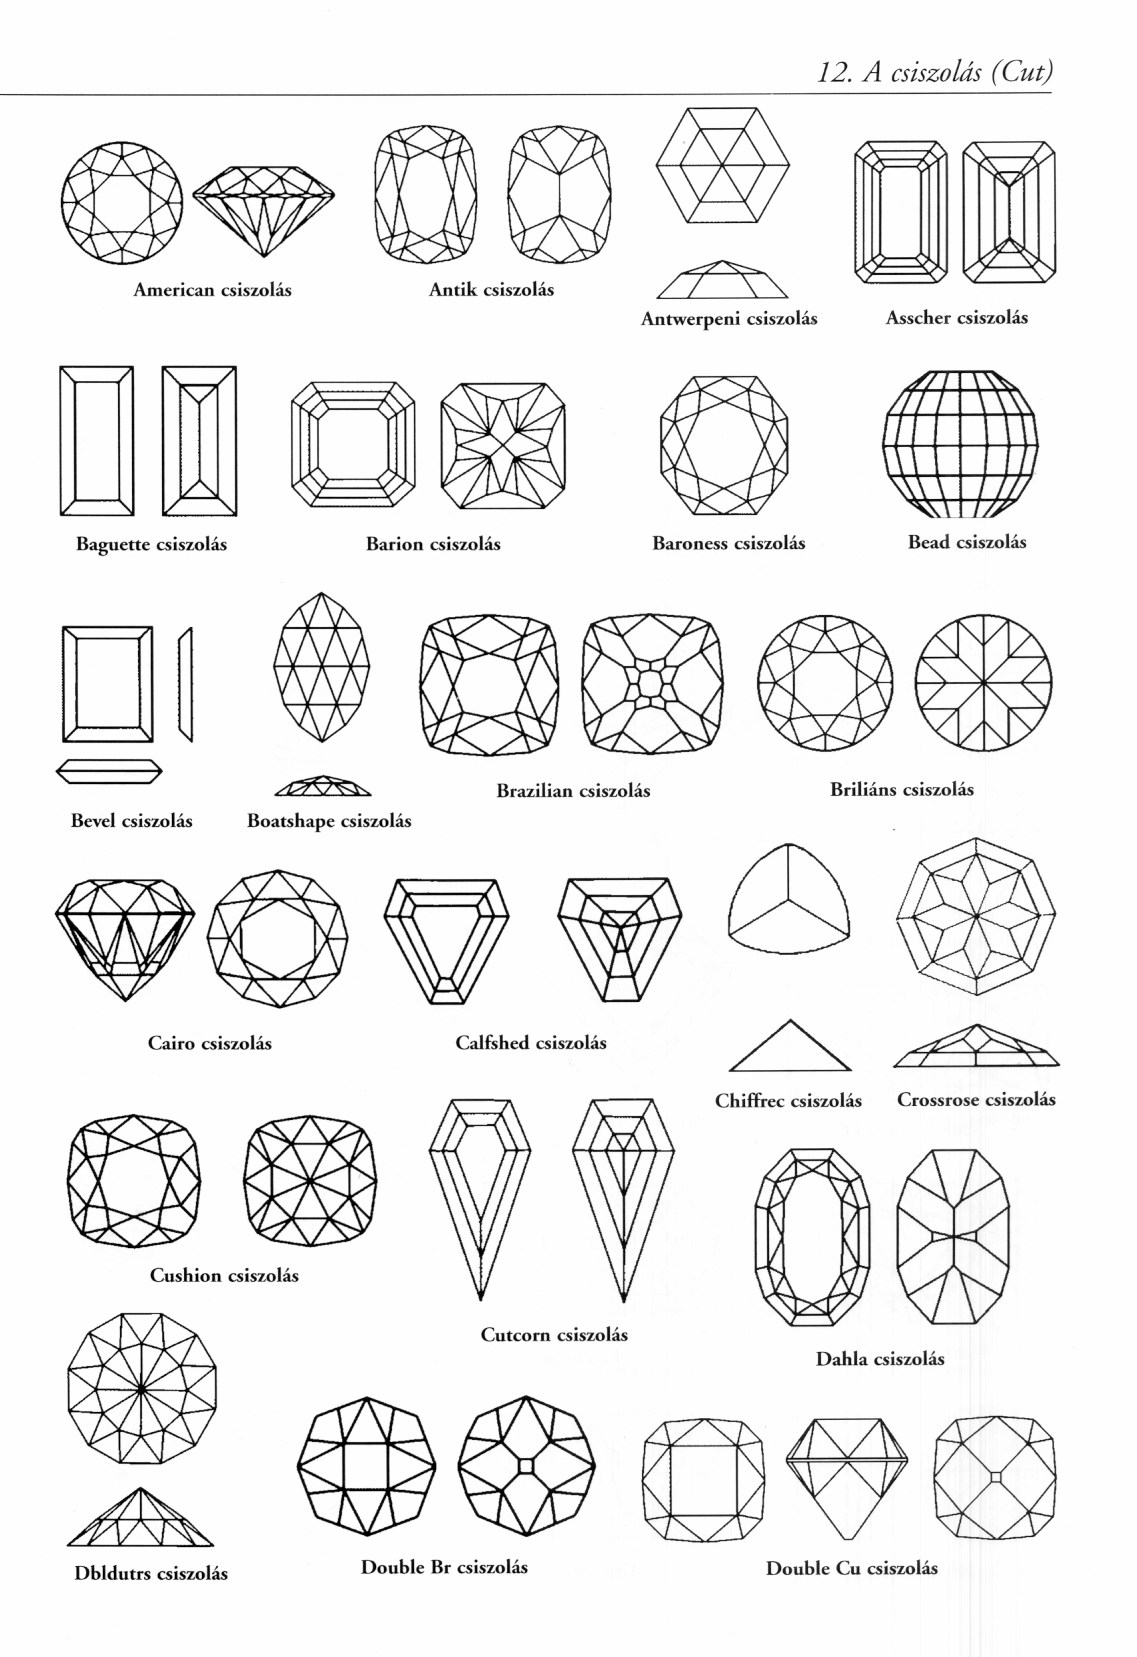 diamond cuts diamond essay Meaning: fight fire with fire diamond cuts diamond  retrieved from  .